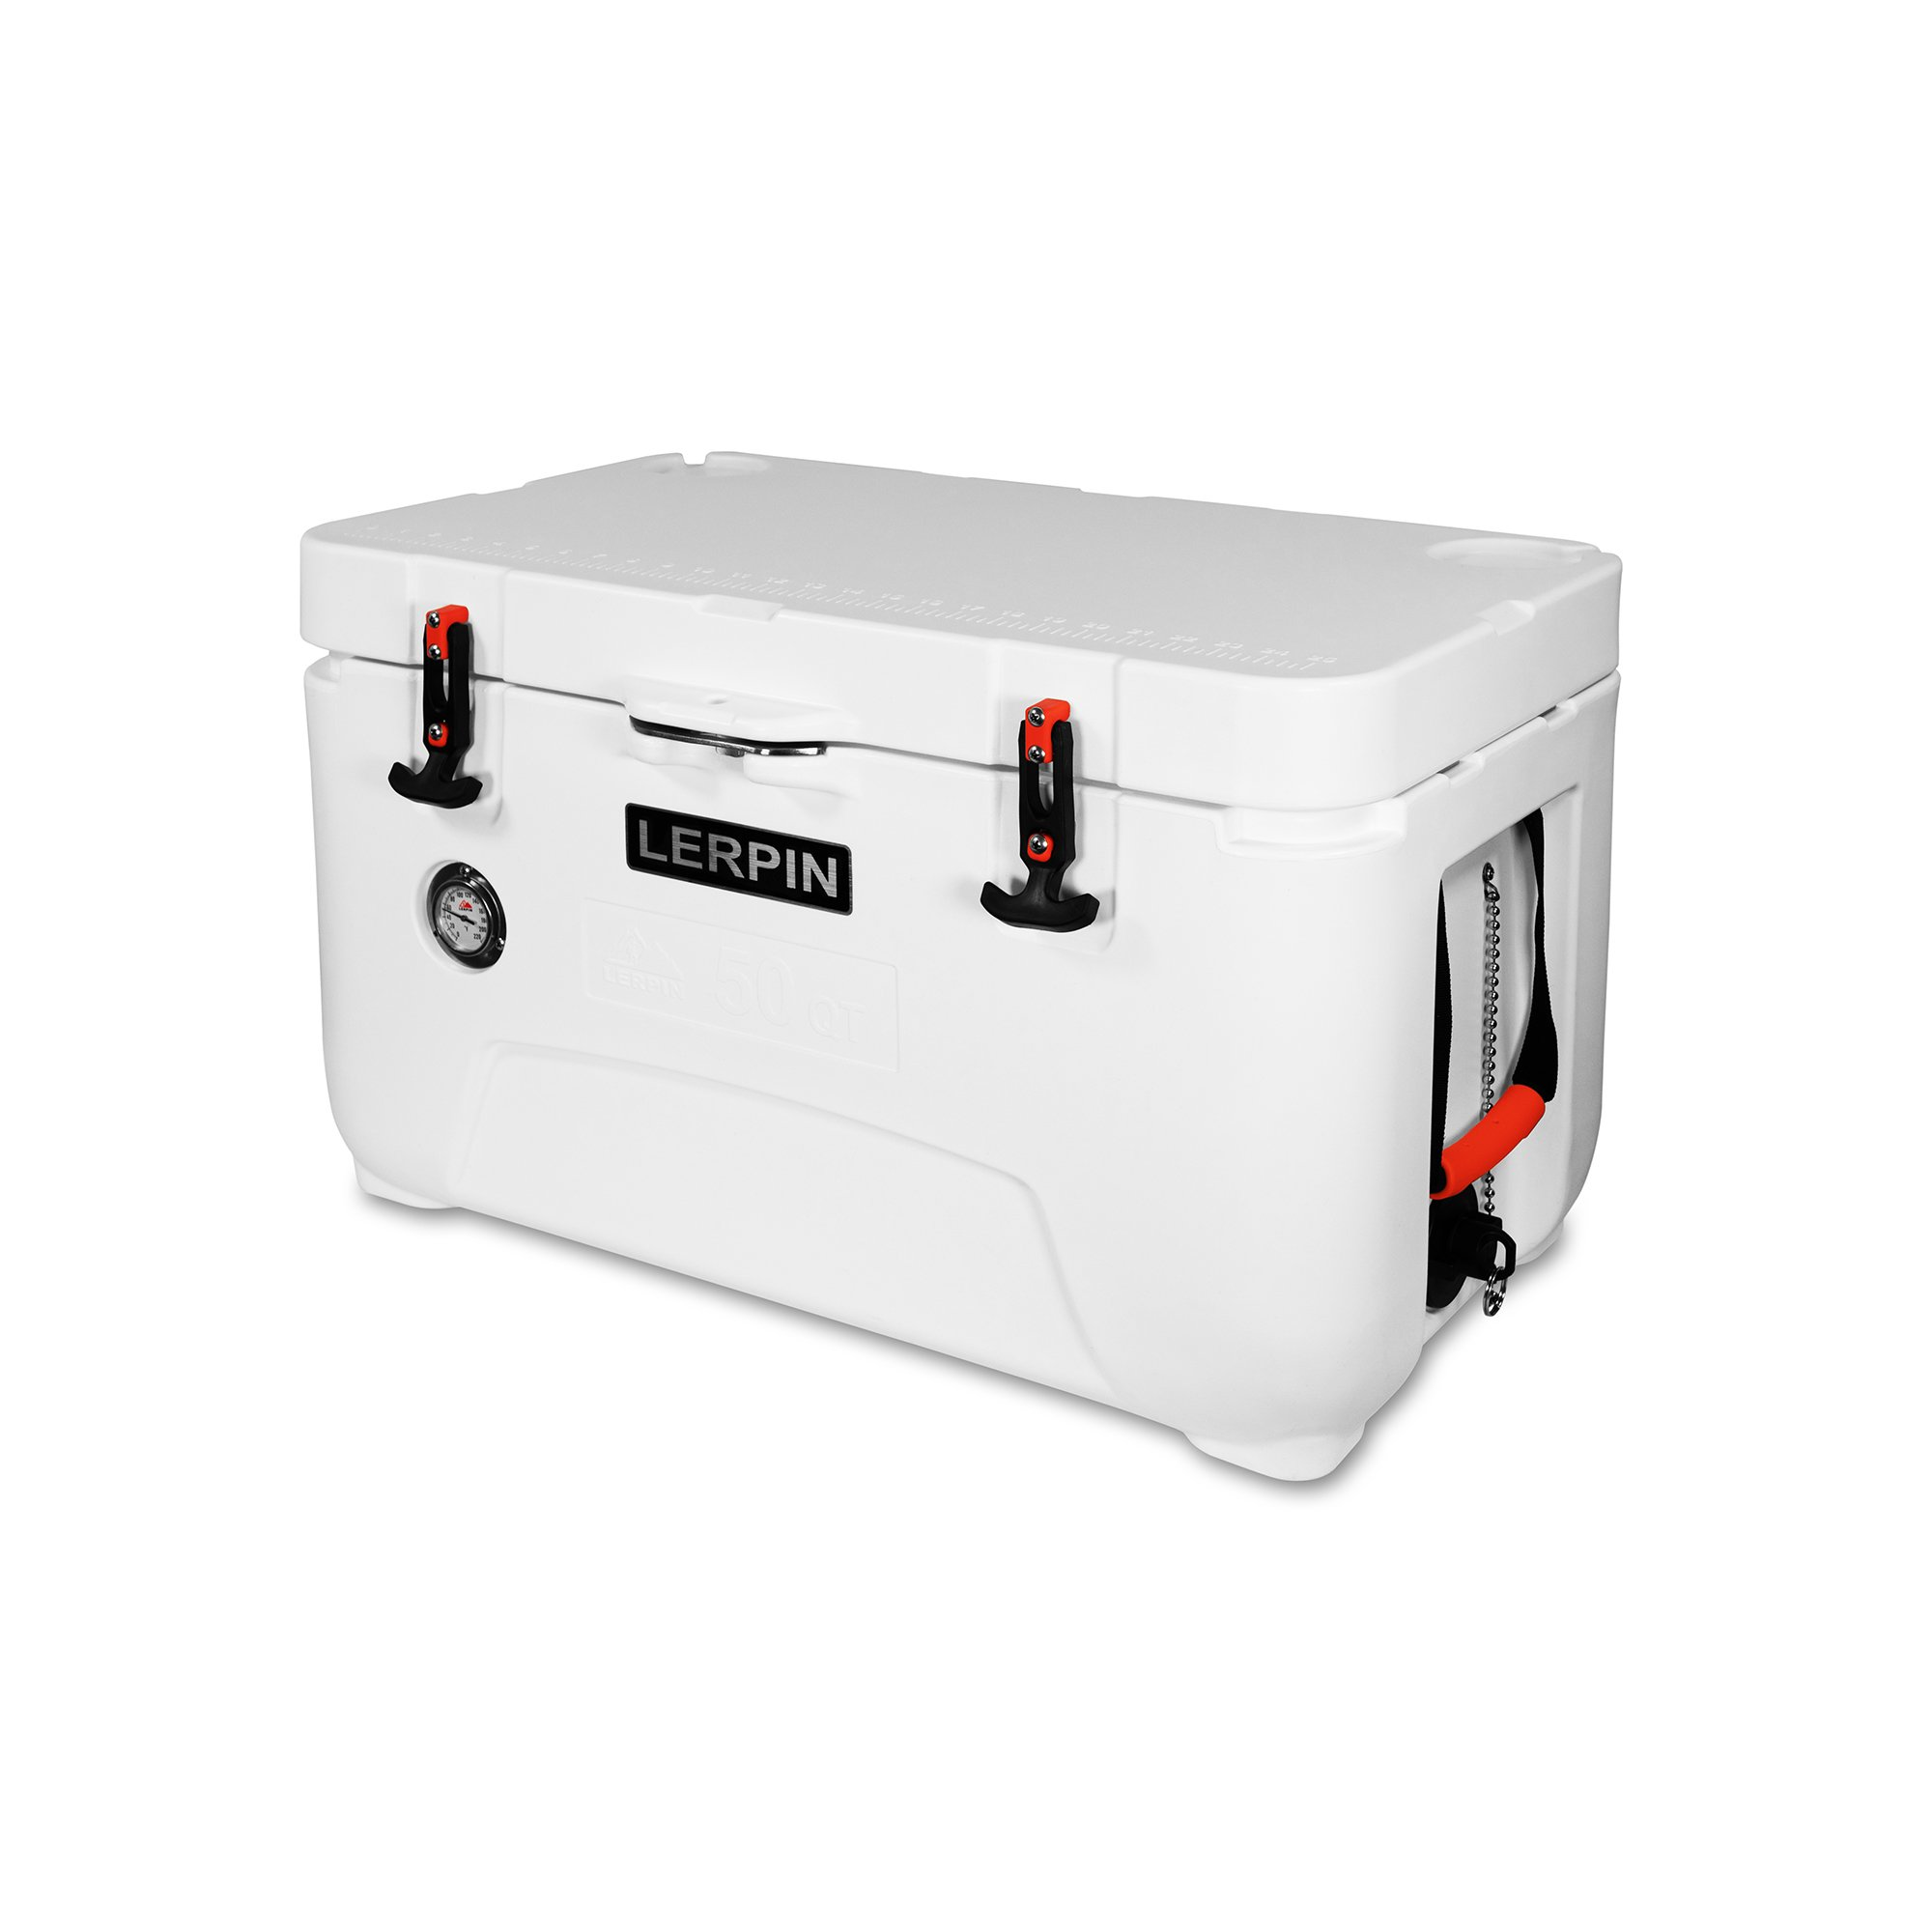 lerpin-brand-rooling-ice-chest-car-cooler-70qt-heavy-duty-cooler-box